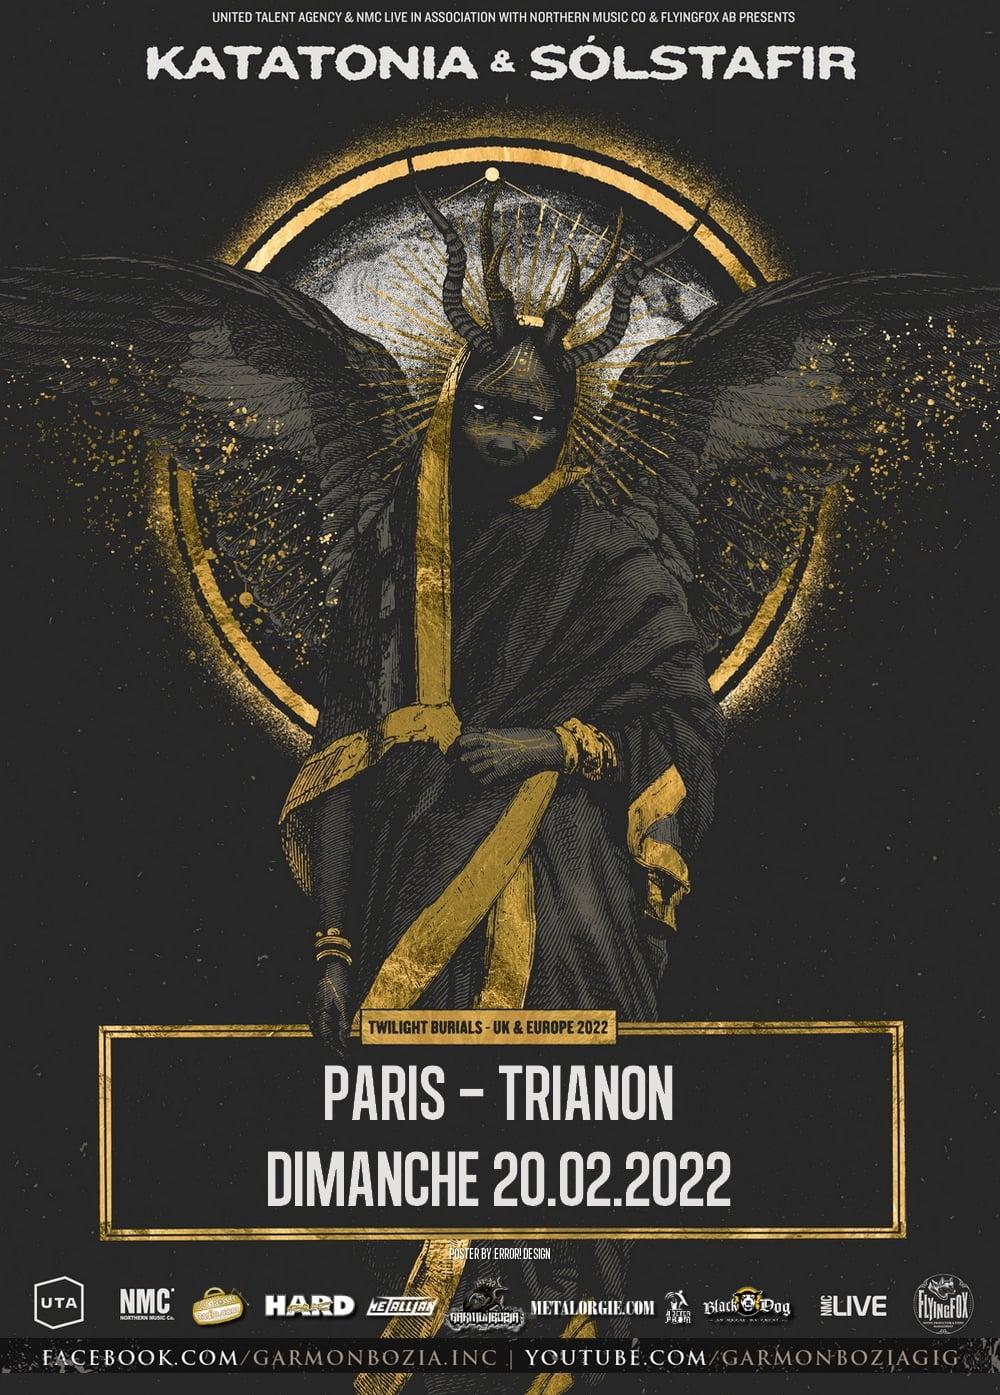 Katatonia + Sólstafir @ Le Trianon (Paris) - 20 février 2022